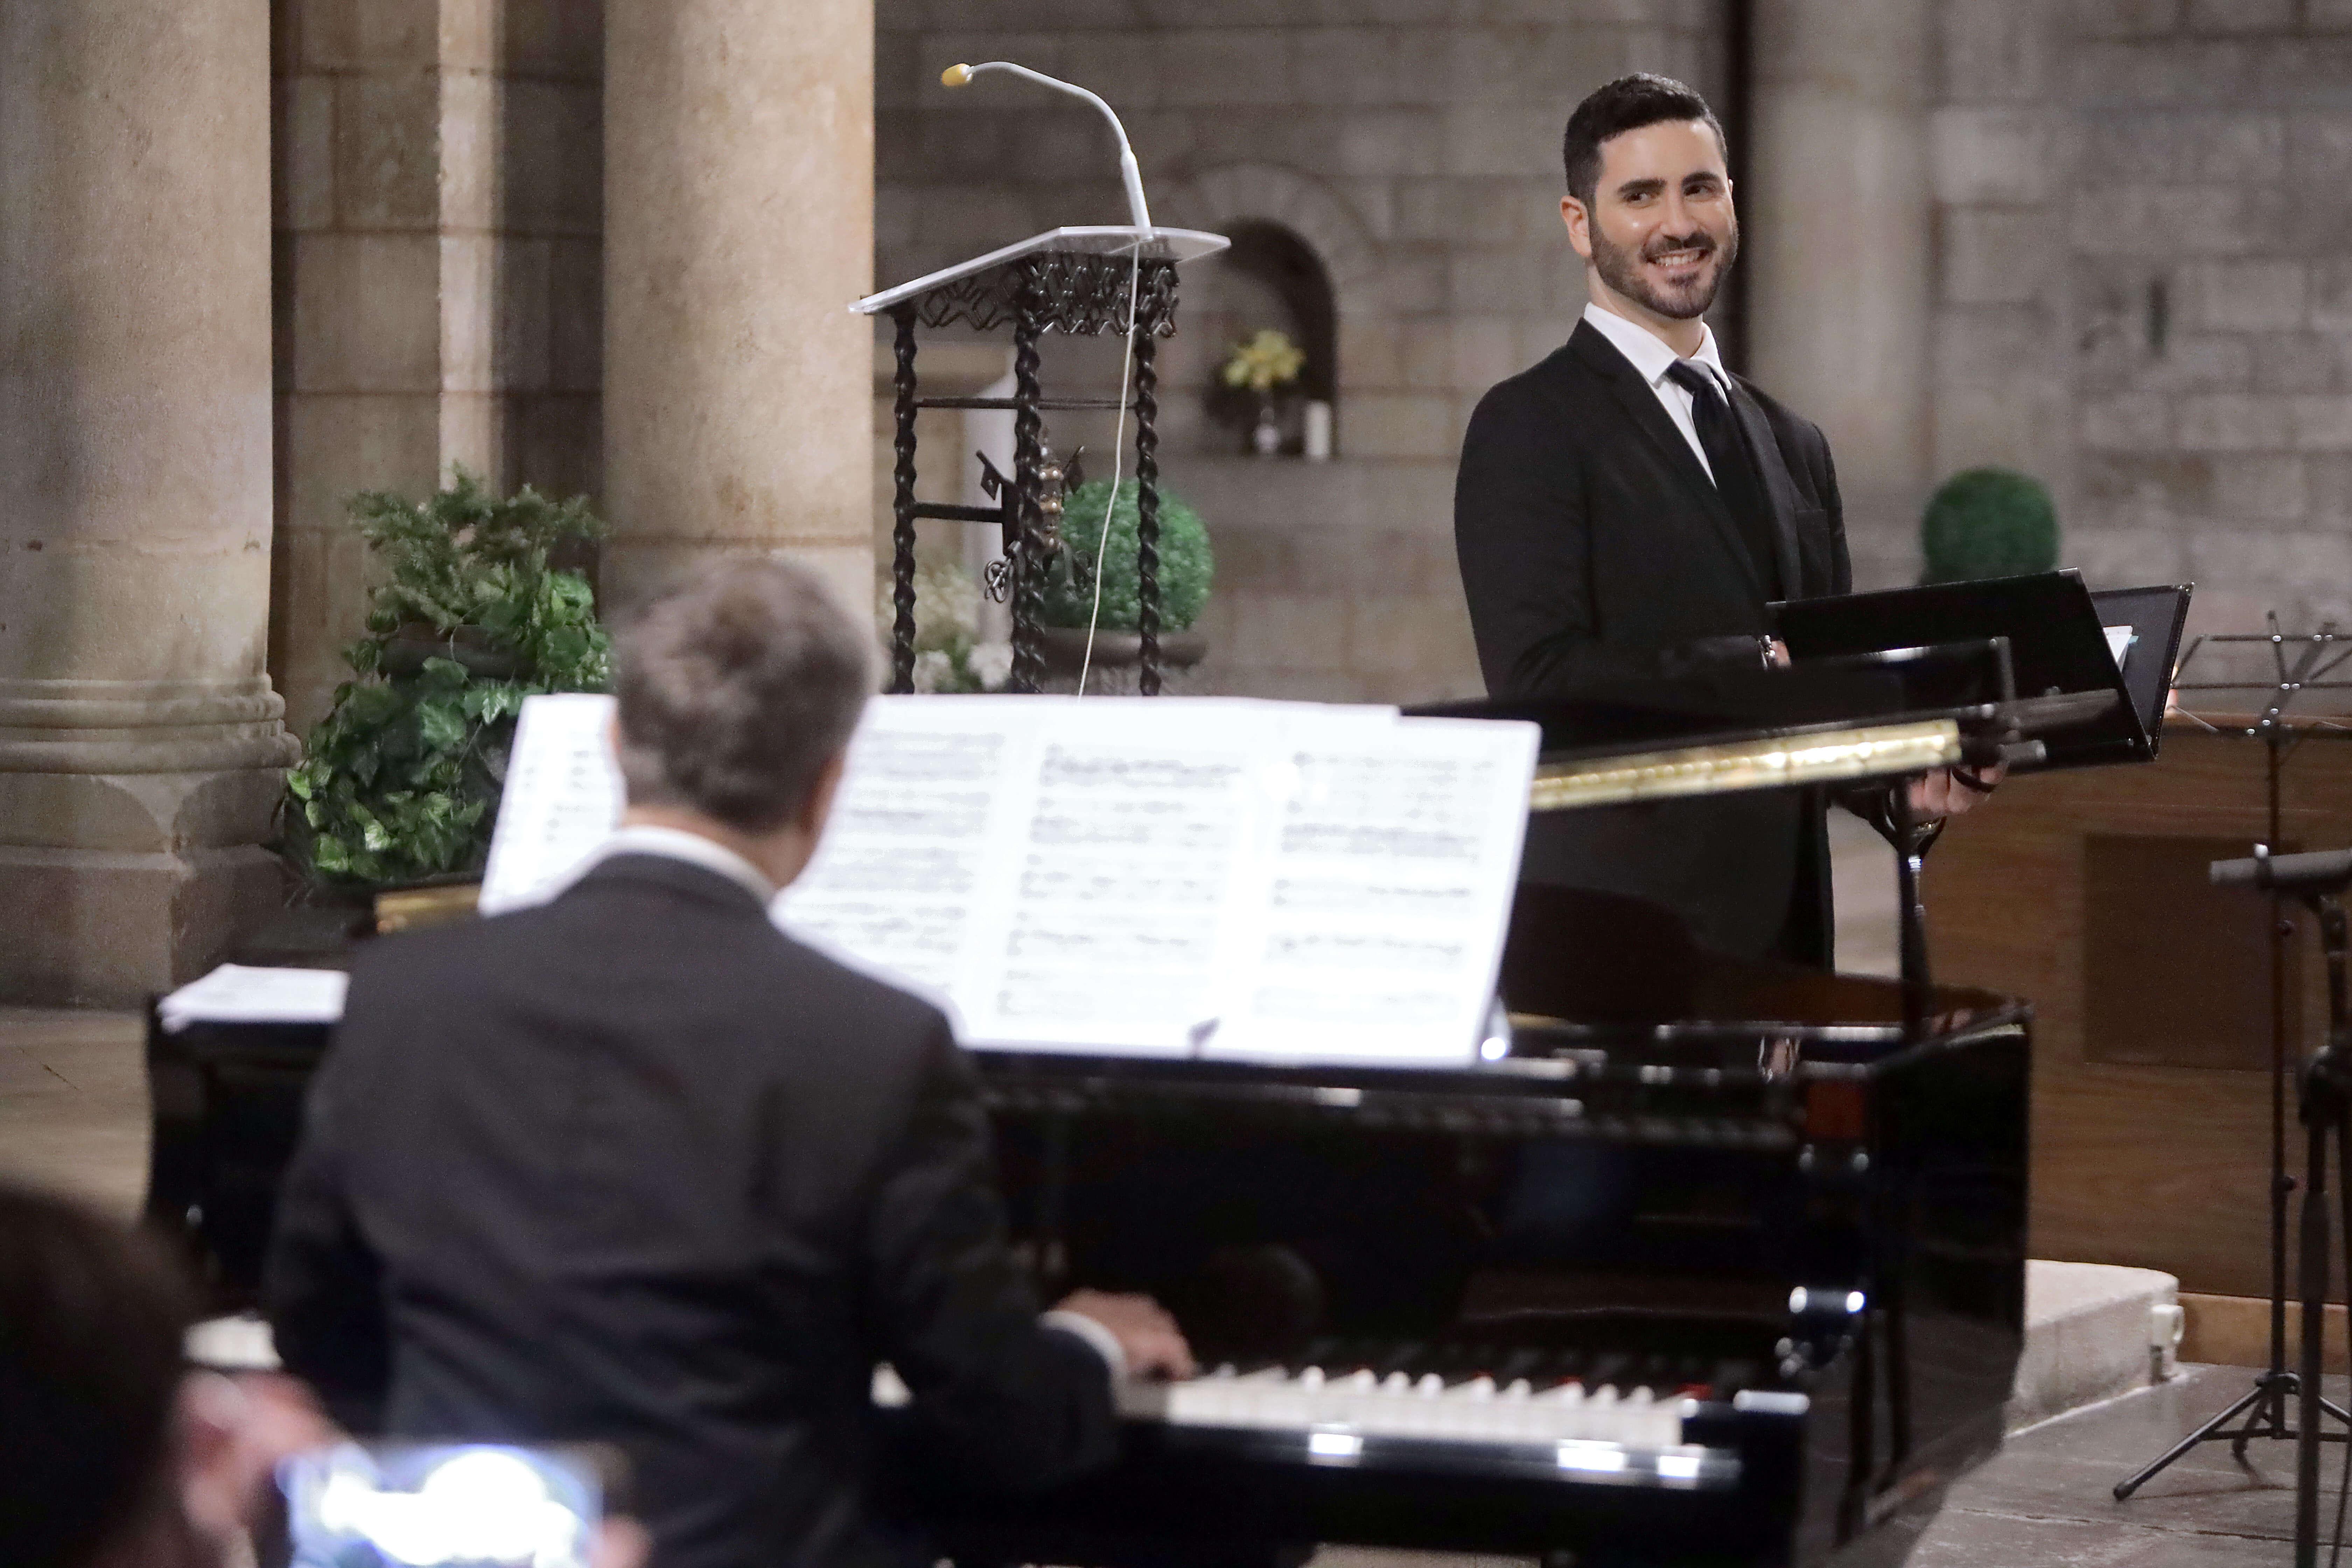 Victor Jimenez i Josep Surinyac en concert. Fotografia de Jordi Bardajil